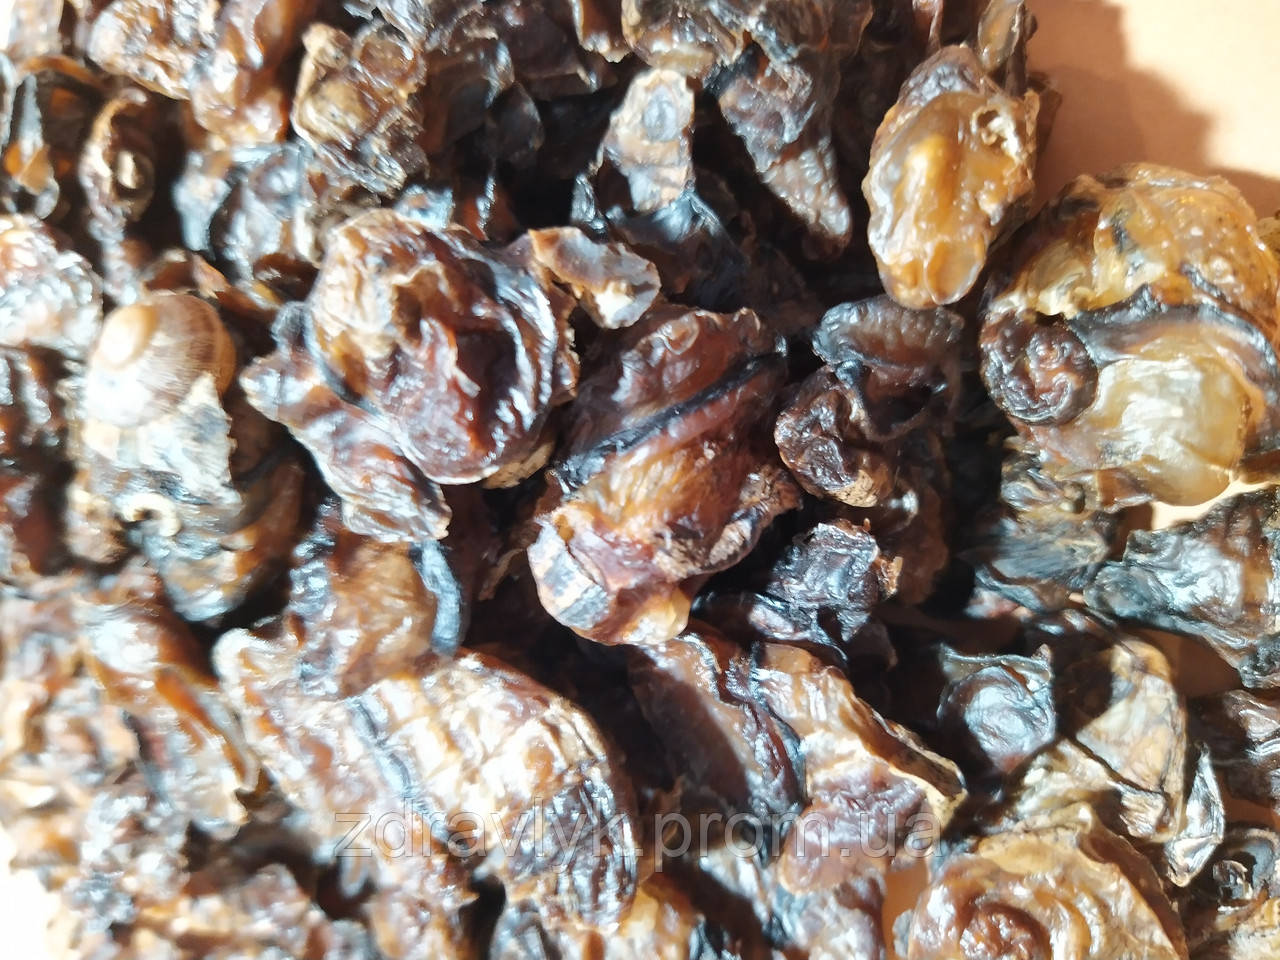 Dried snail meat